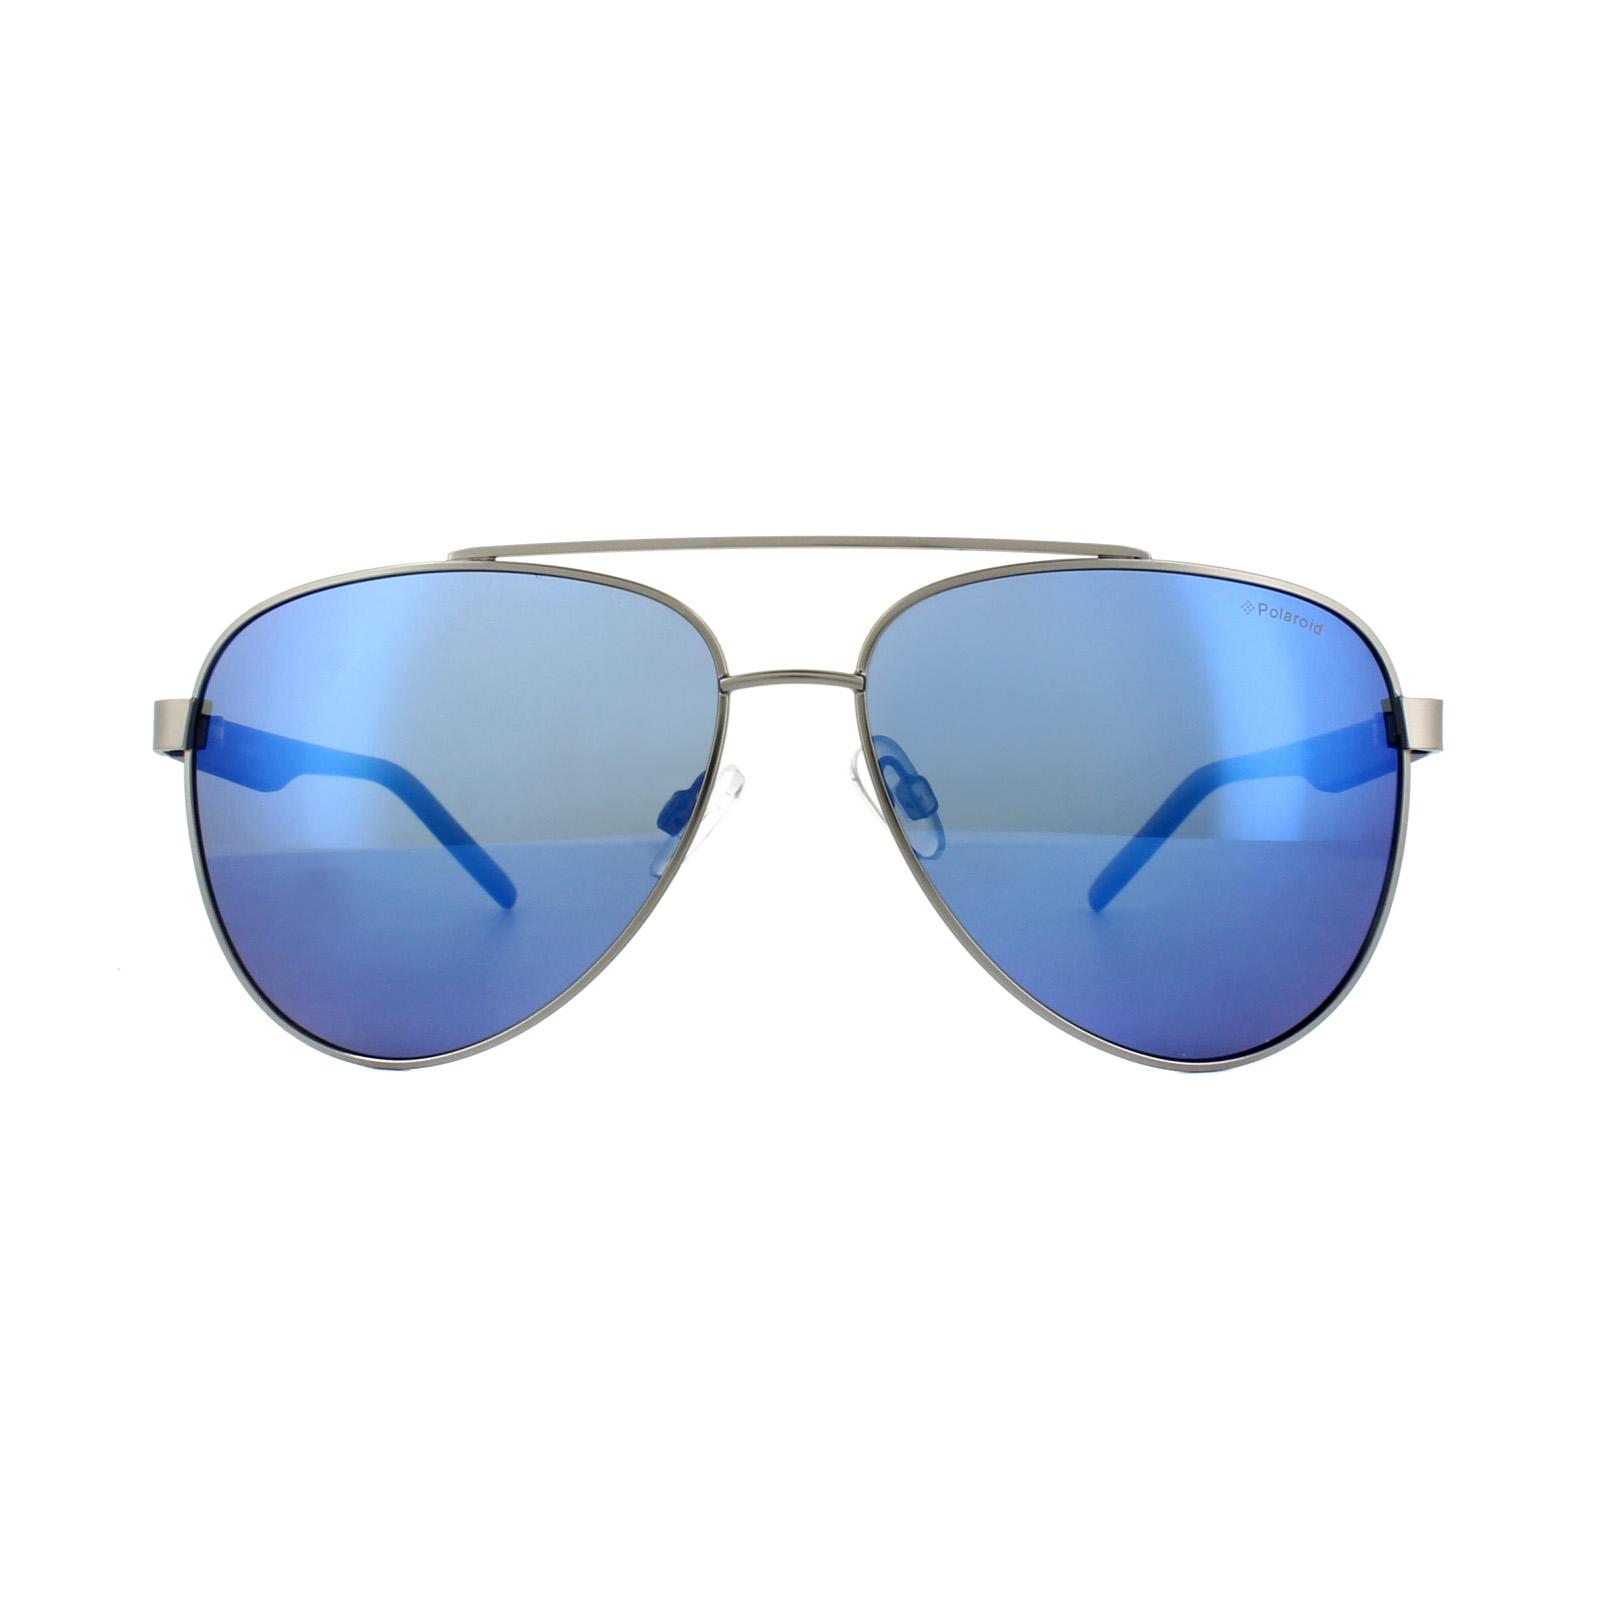 c413acd8d5126 Sentinel Polaroid Sunglasses PLD 2043 S R80 5X Silver Matt Blue Blue Mirror  Polarized